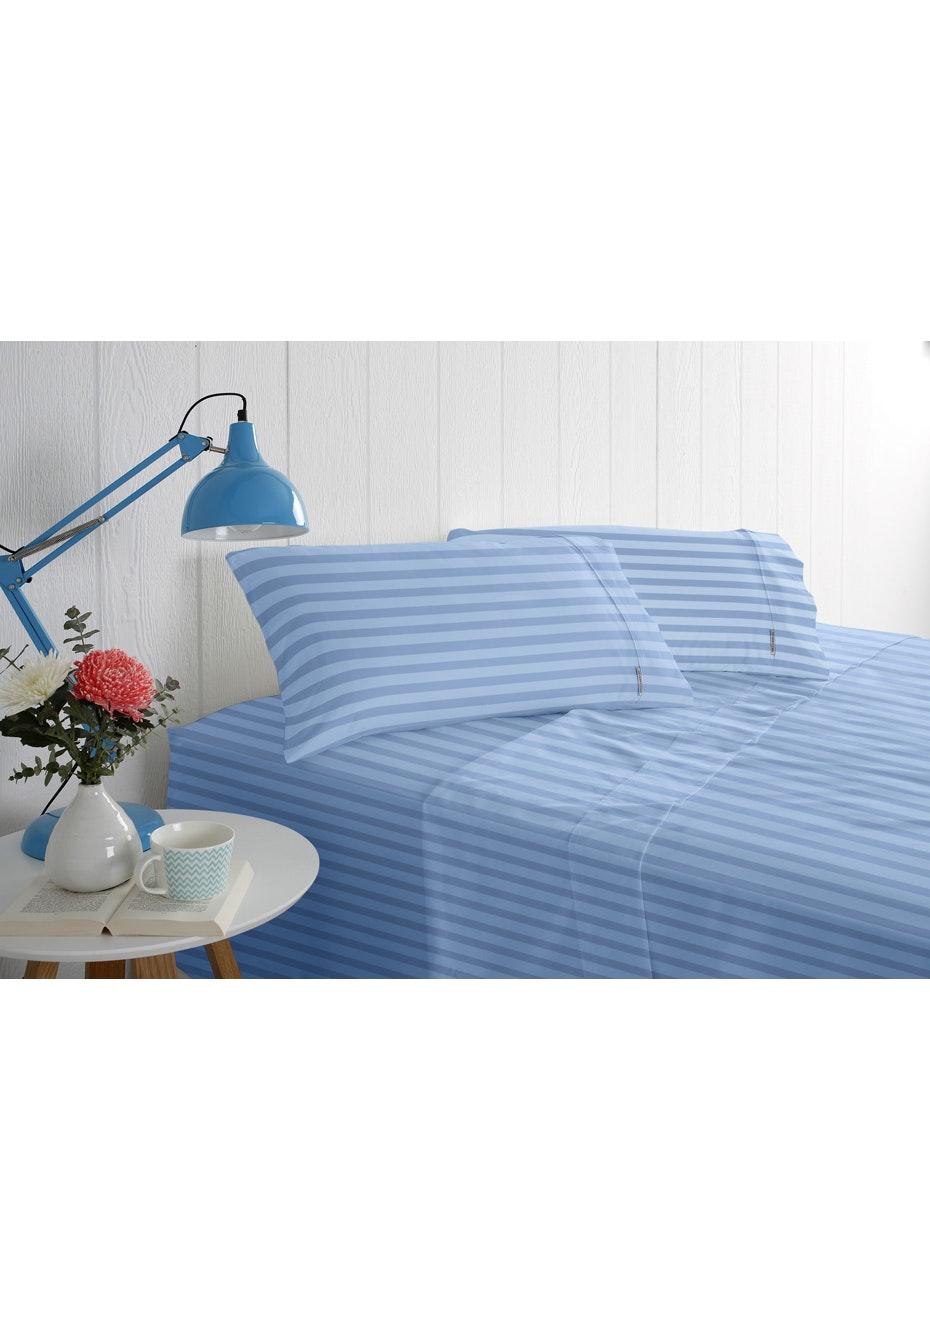 Odyssey Living 1000 Thread Count - Cotton Rich Solid Sateen -Bluebird - Queen Bed